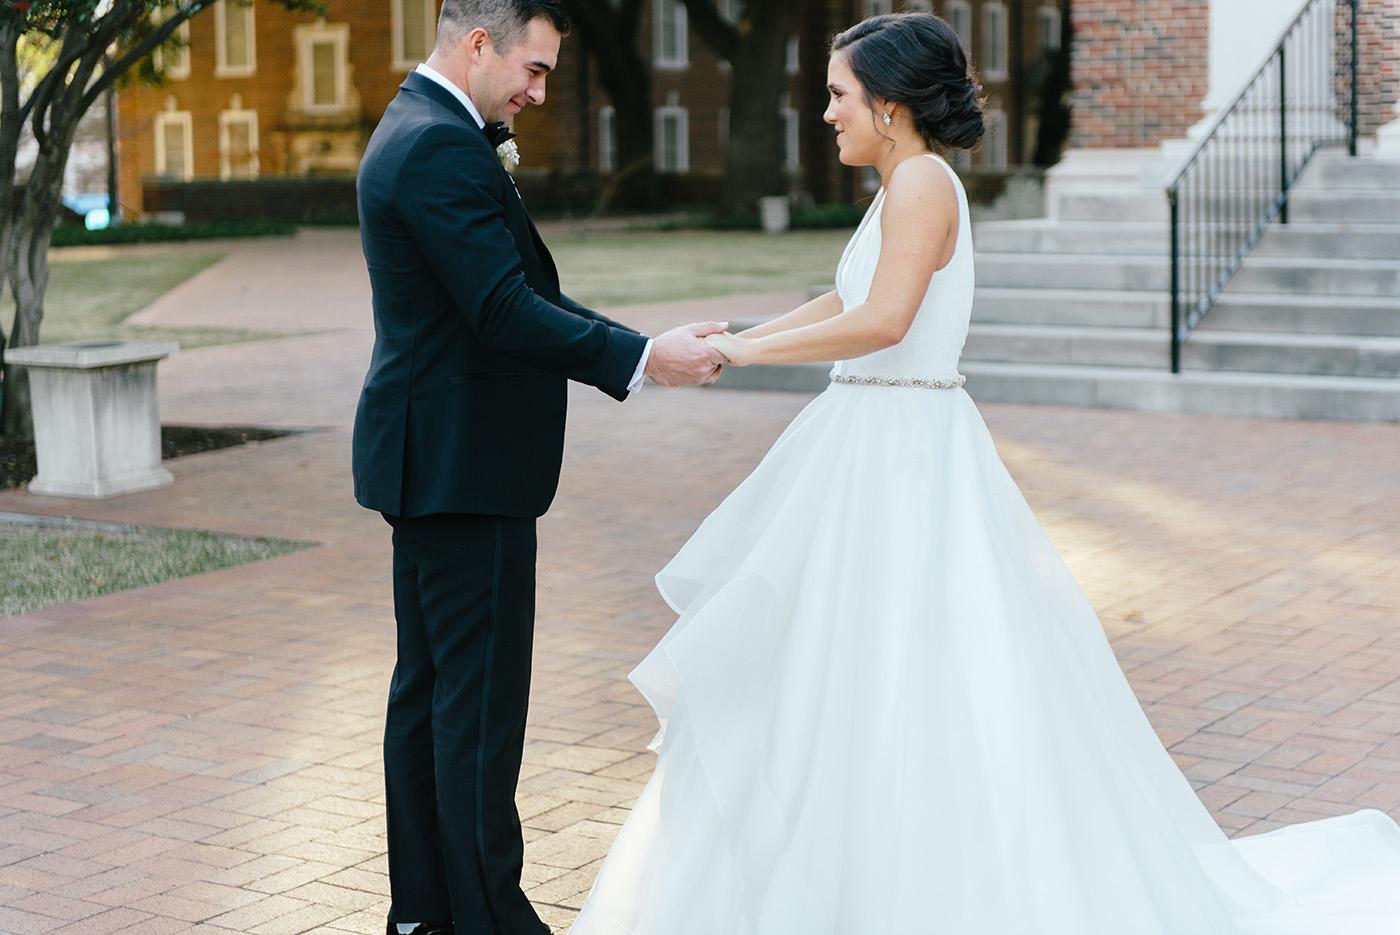 Dallas Wedding Planner - Winter Wedding at The Room on Main - Allday Events - 113.jpg